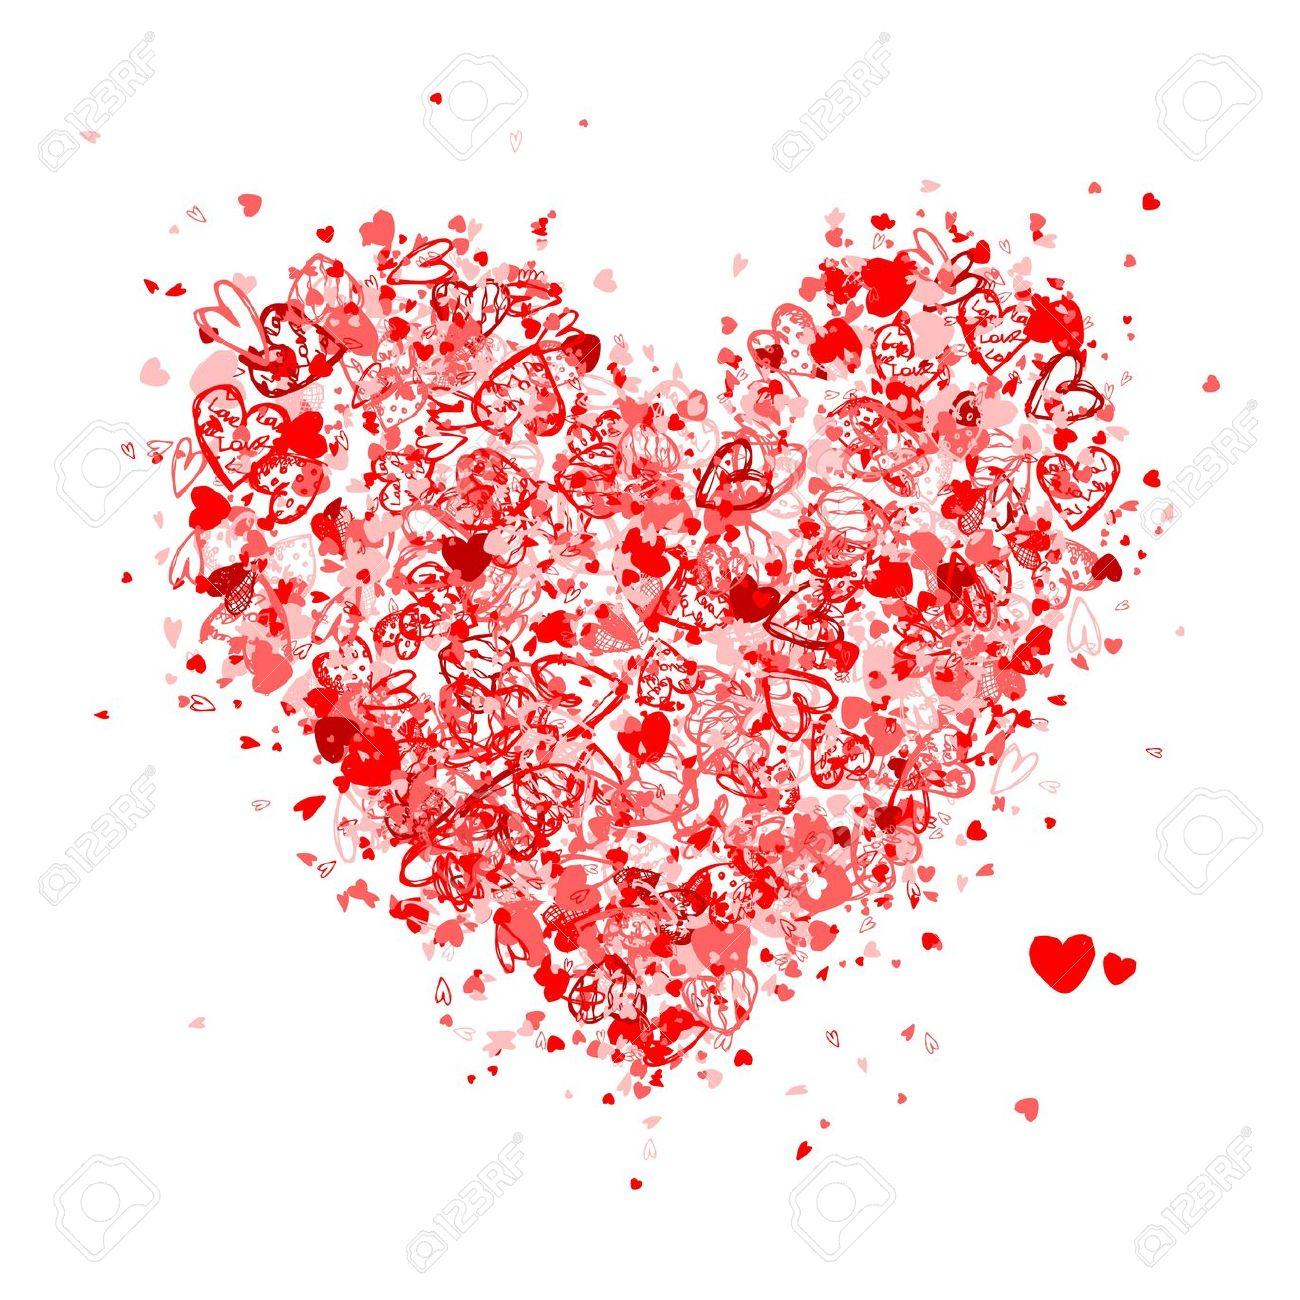 San valentino clipart.